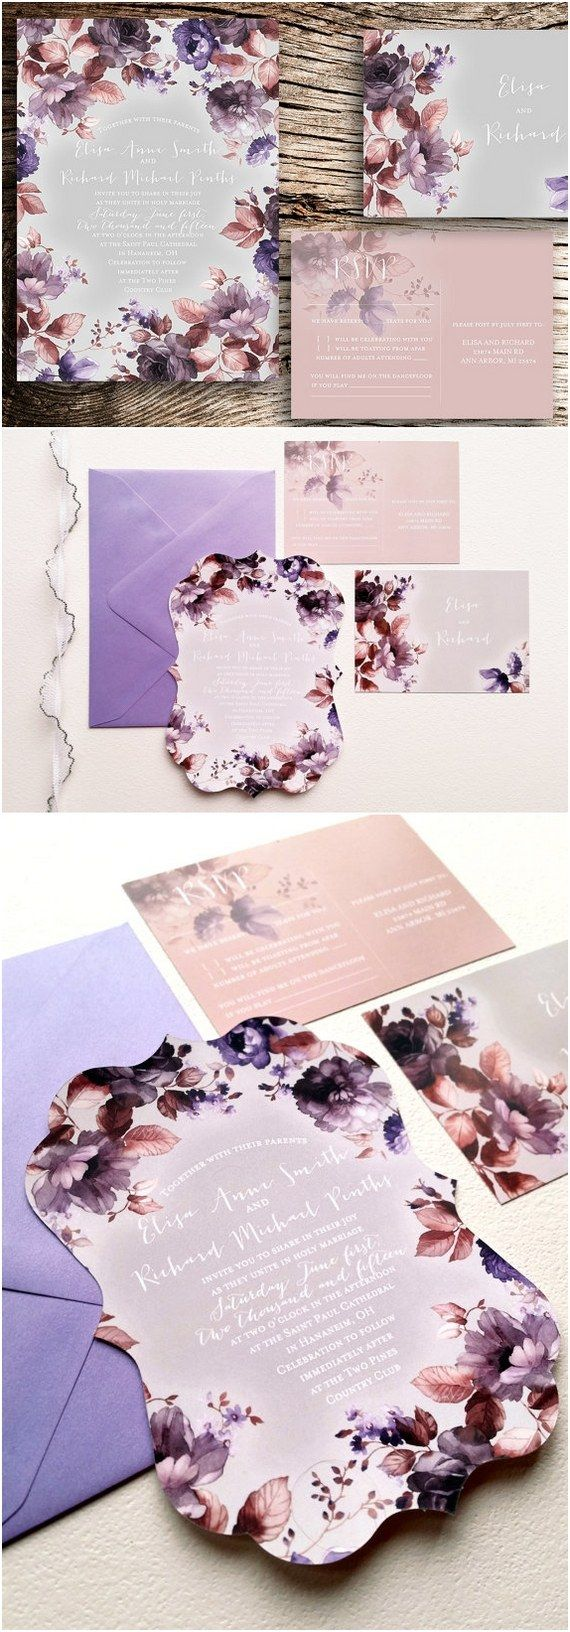 die cut wedding invitations floral wedding invitations die cut covington design ornate die - Purple Wedding Invitations